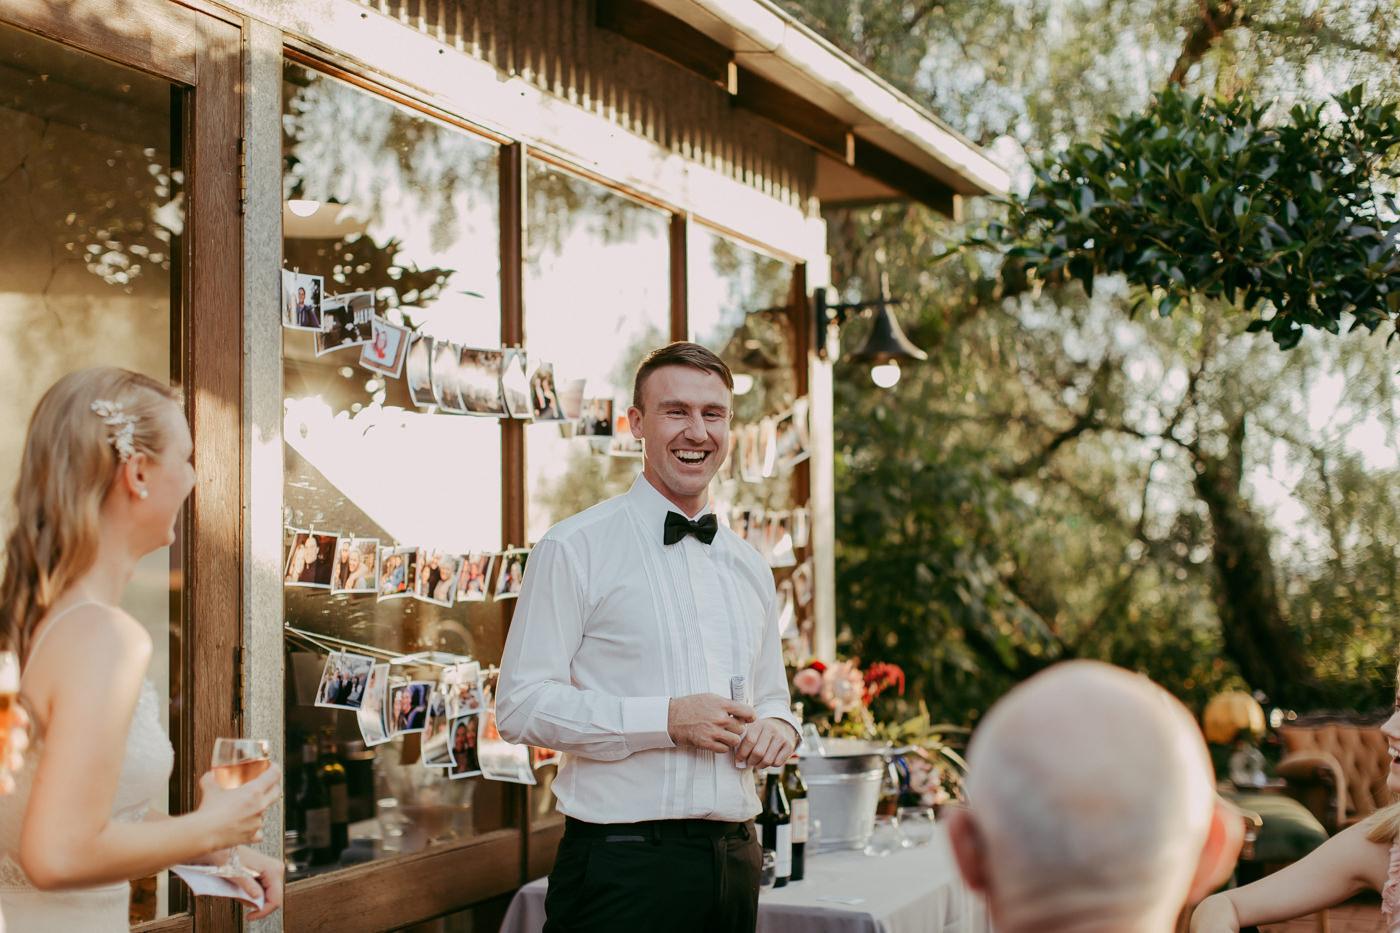 Anthony & Eliet - Wagga Wagga Wedding - Country NSW - Samantha Heather Photography-137.jpg